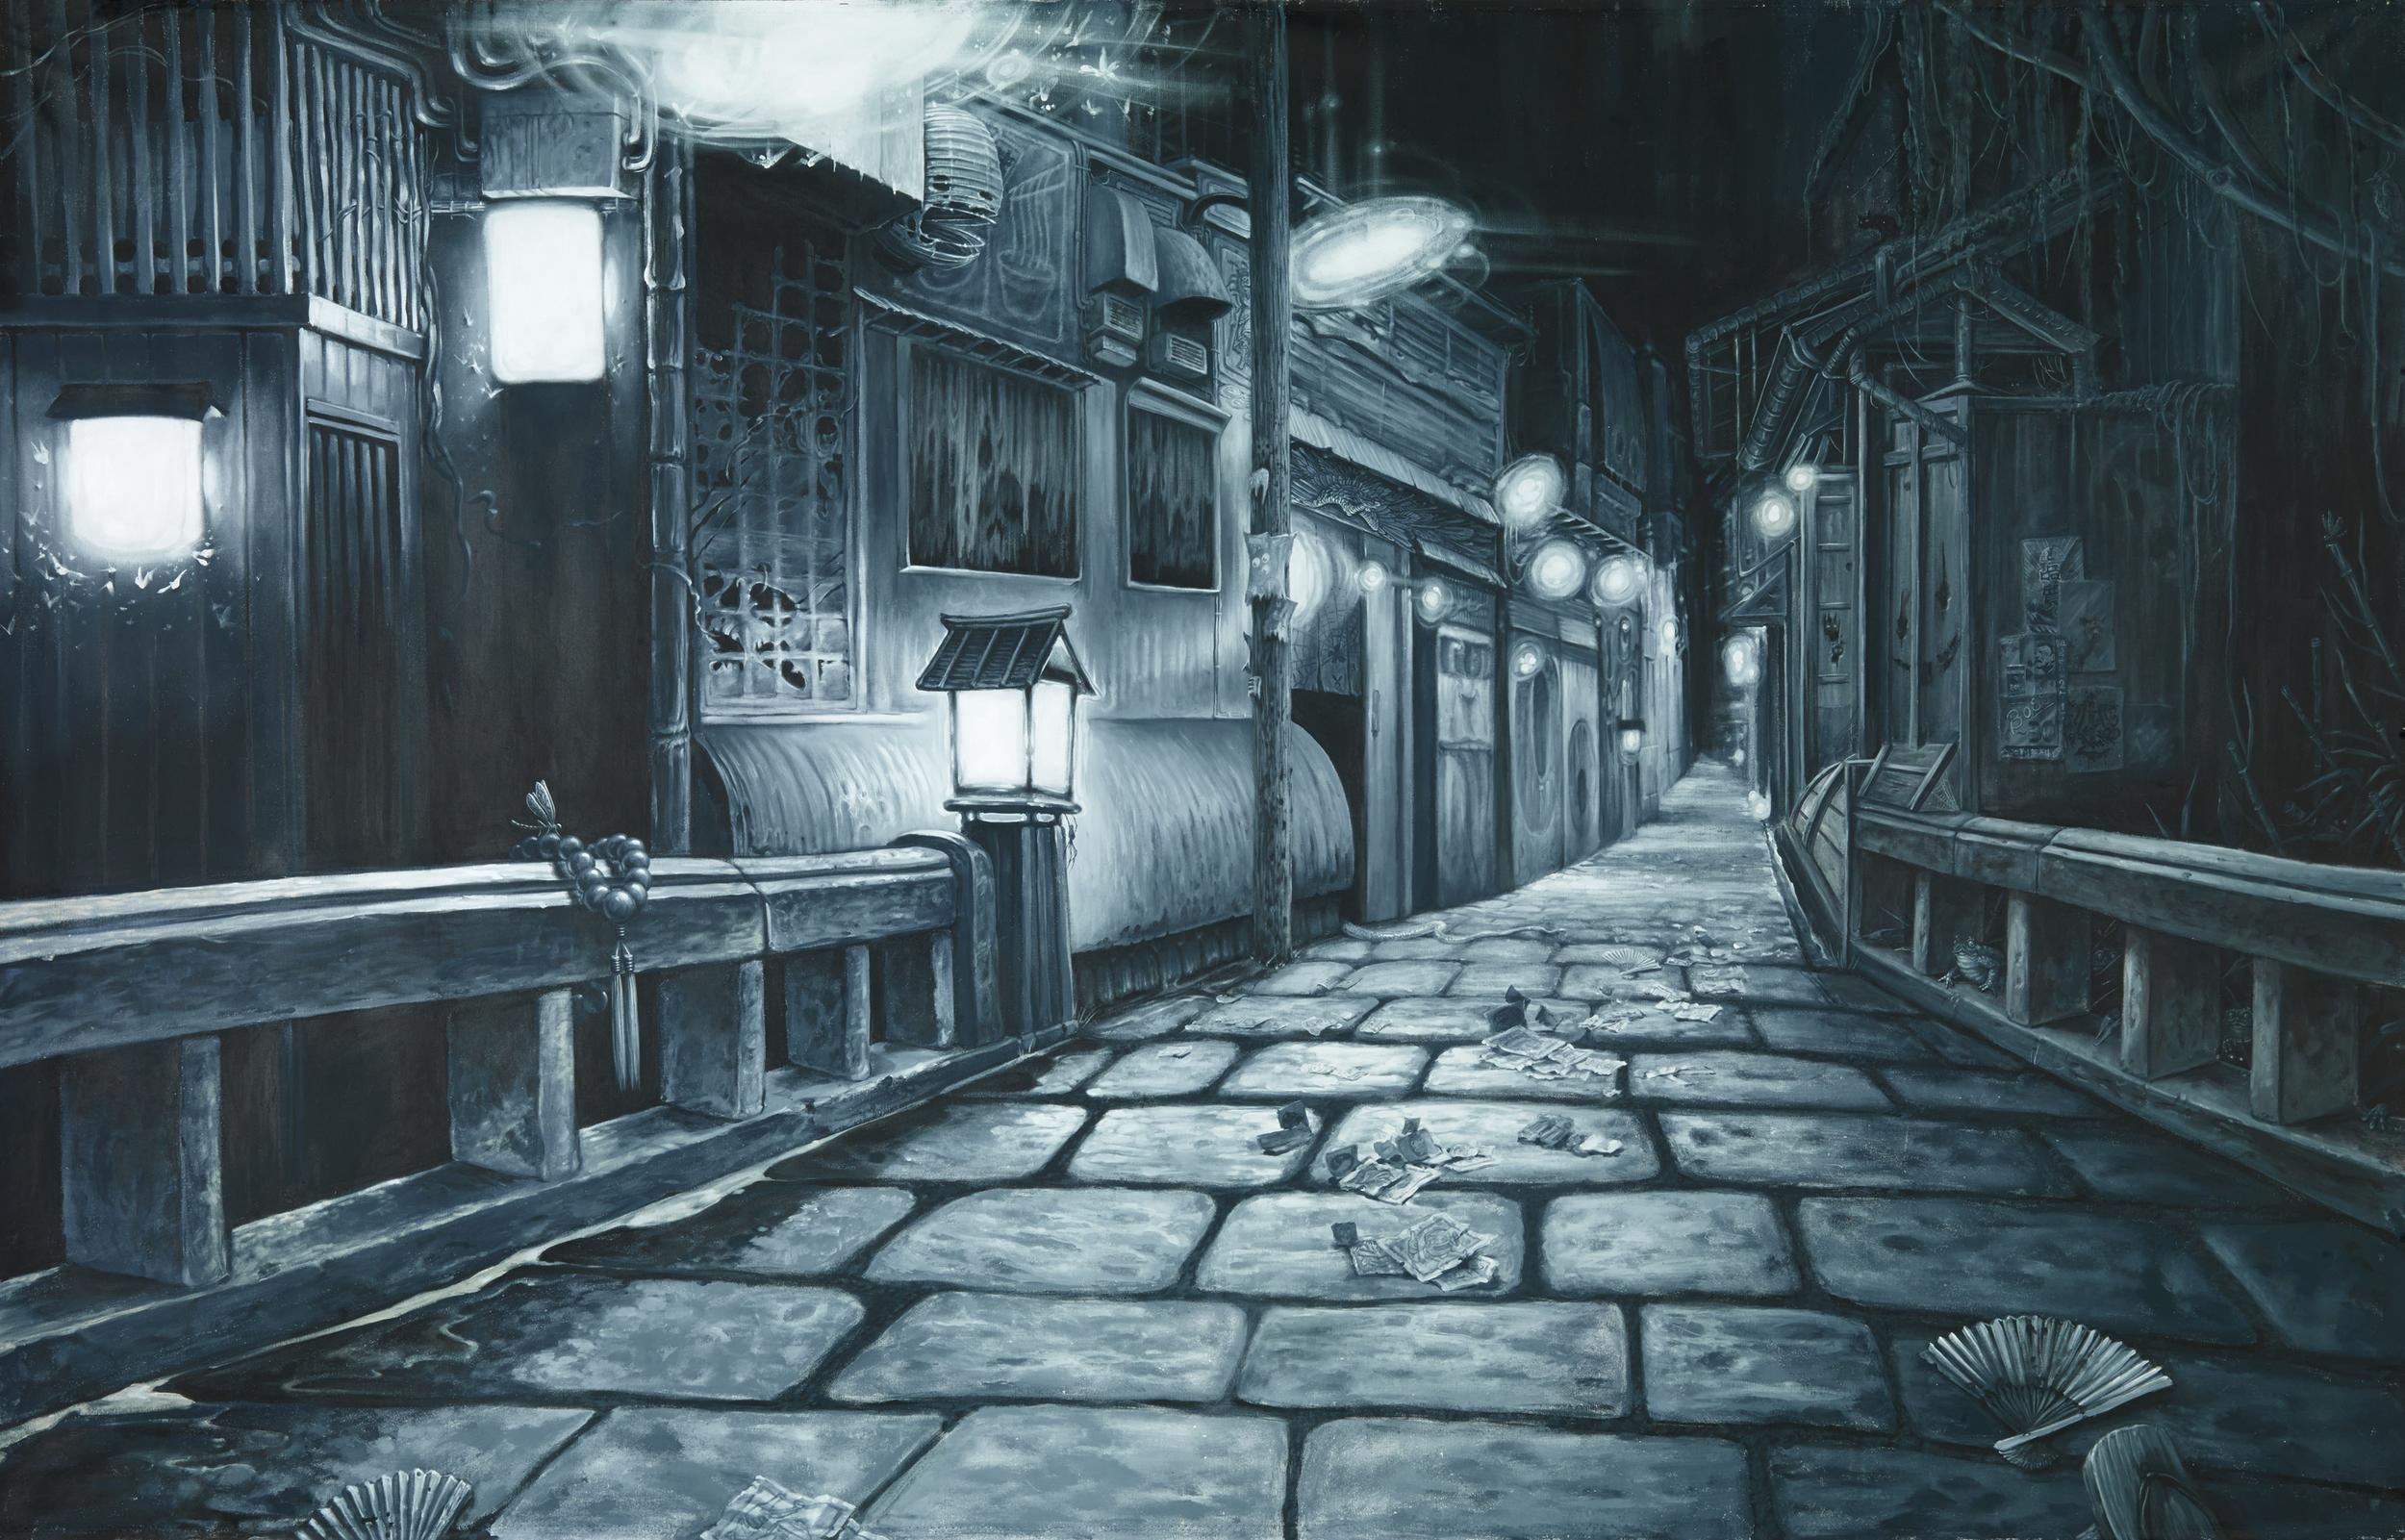 Chris Brand, Espi, Evan Skrederstu & Steve Martinez.  Yokai Street . 2014 - acrylic on canvas, 6' x 8'.